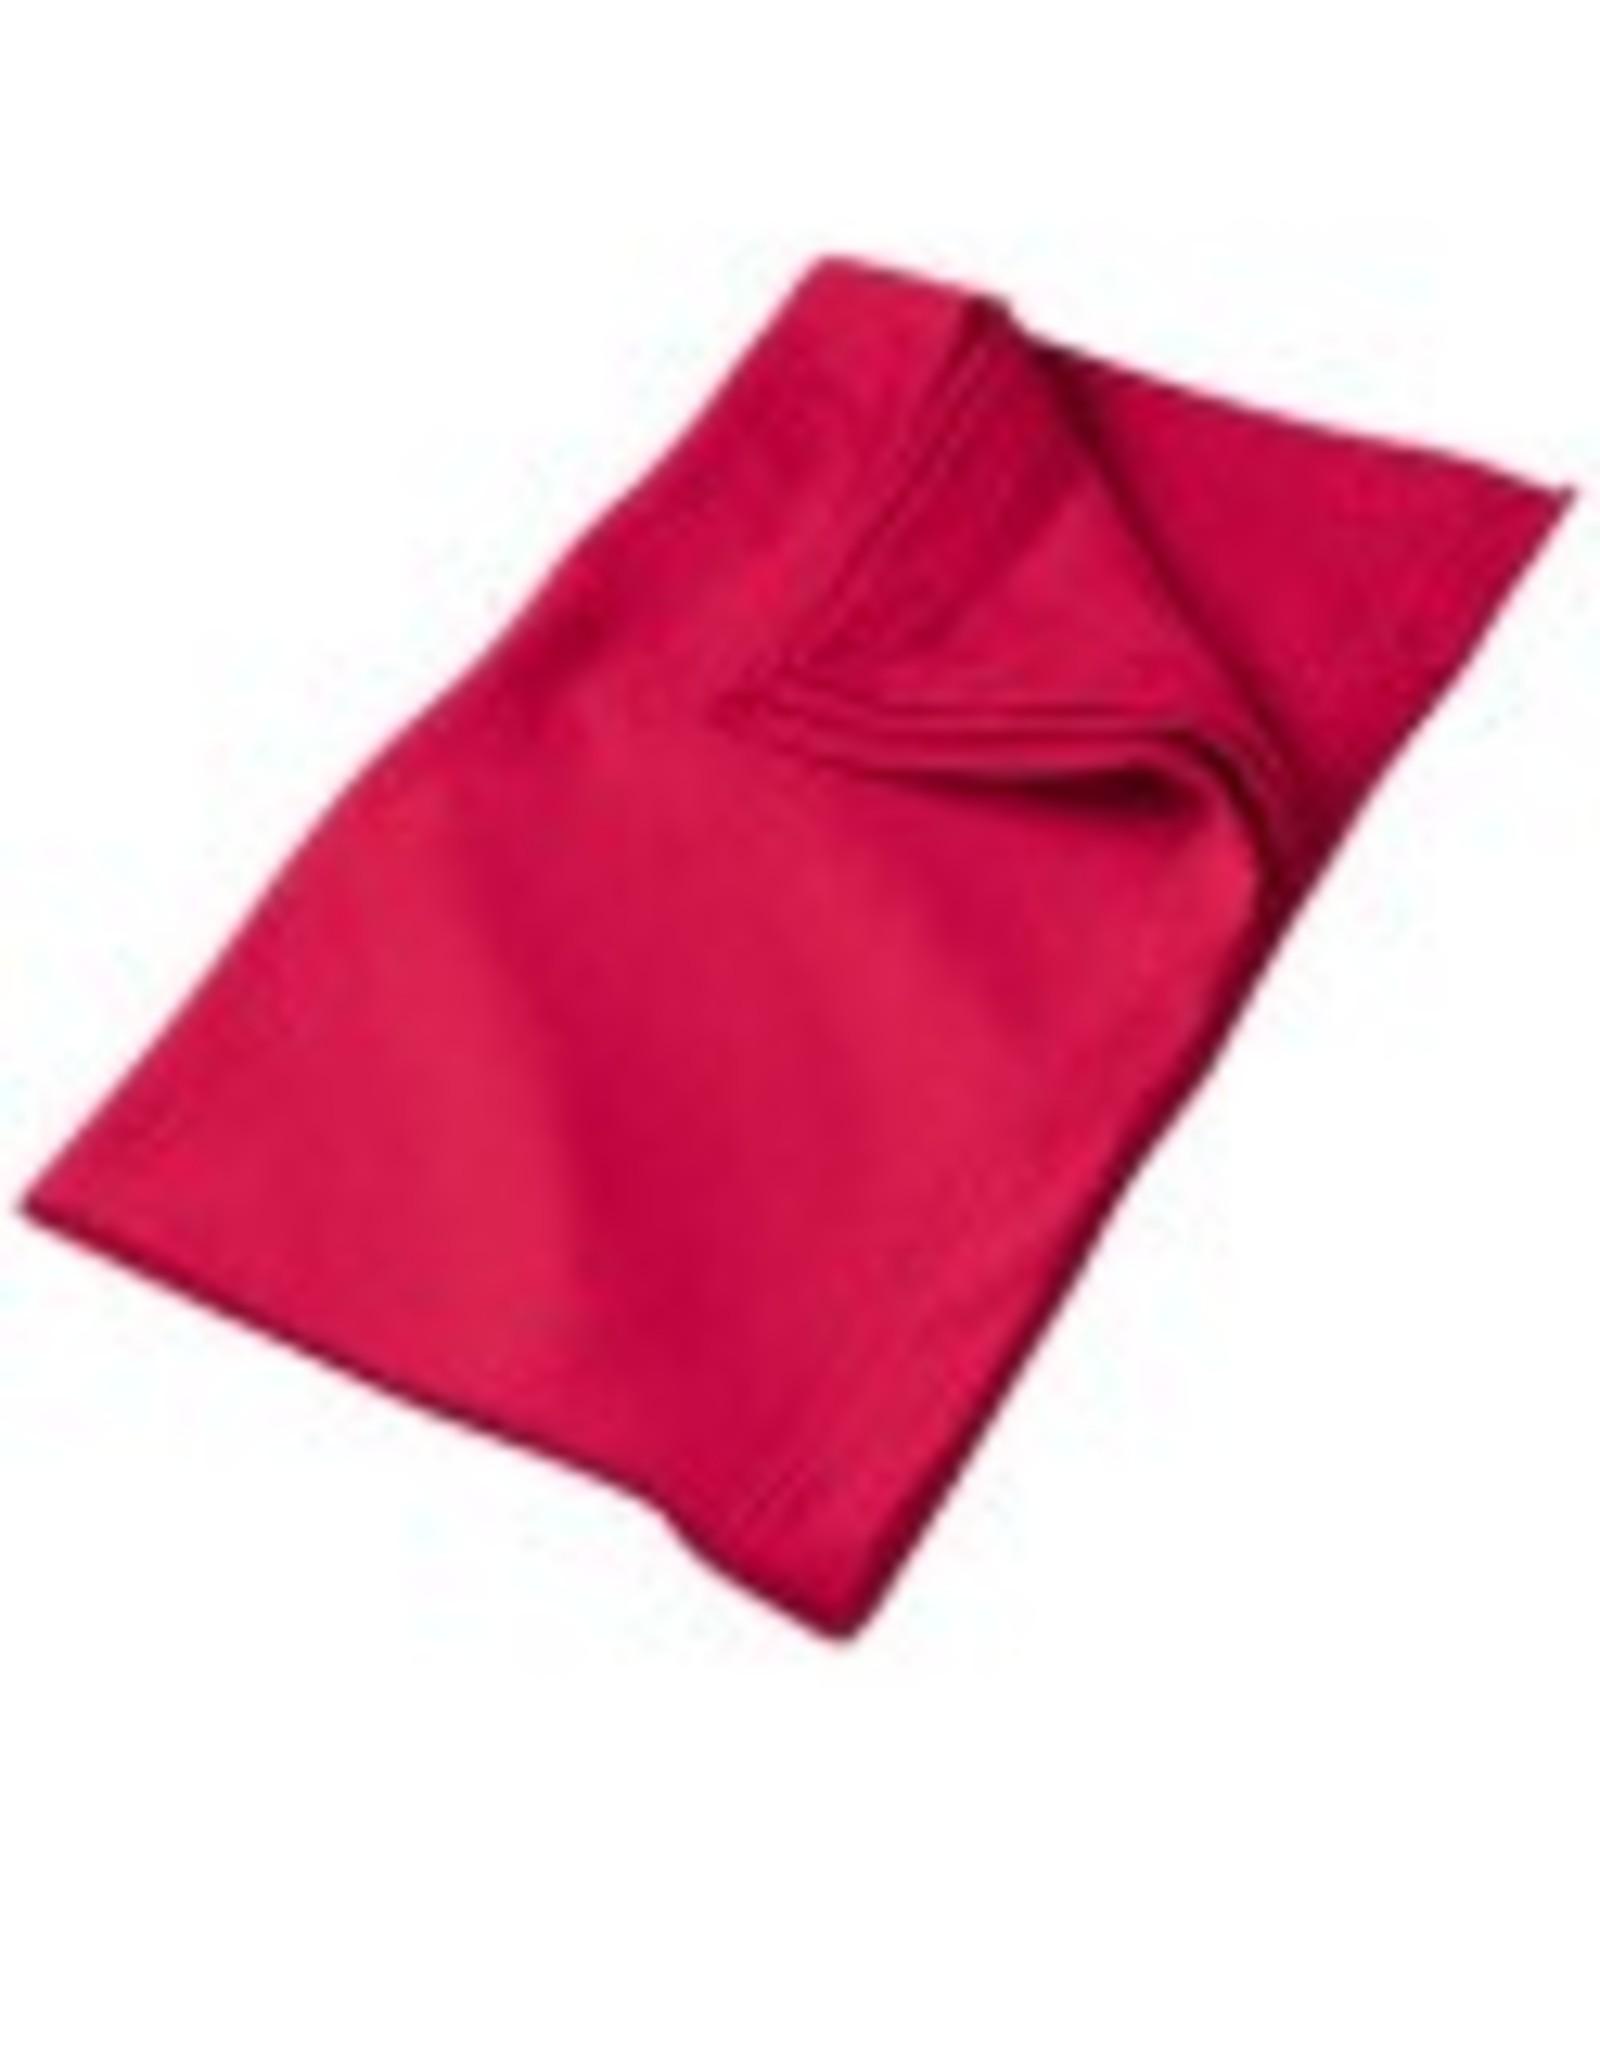 Gildan Sweat Fleece Blanket Cardinal red